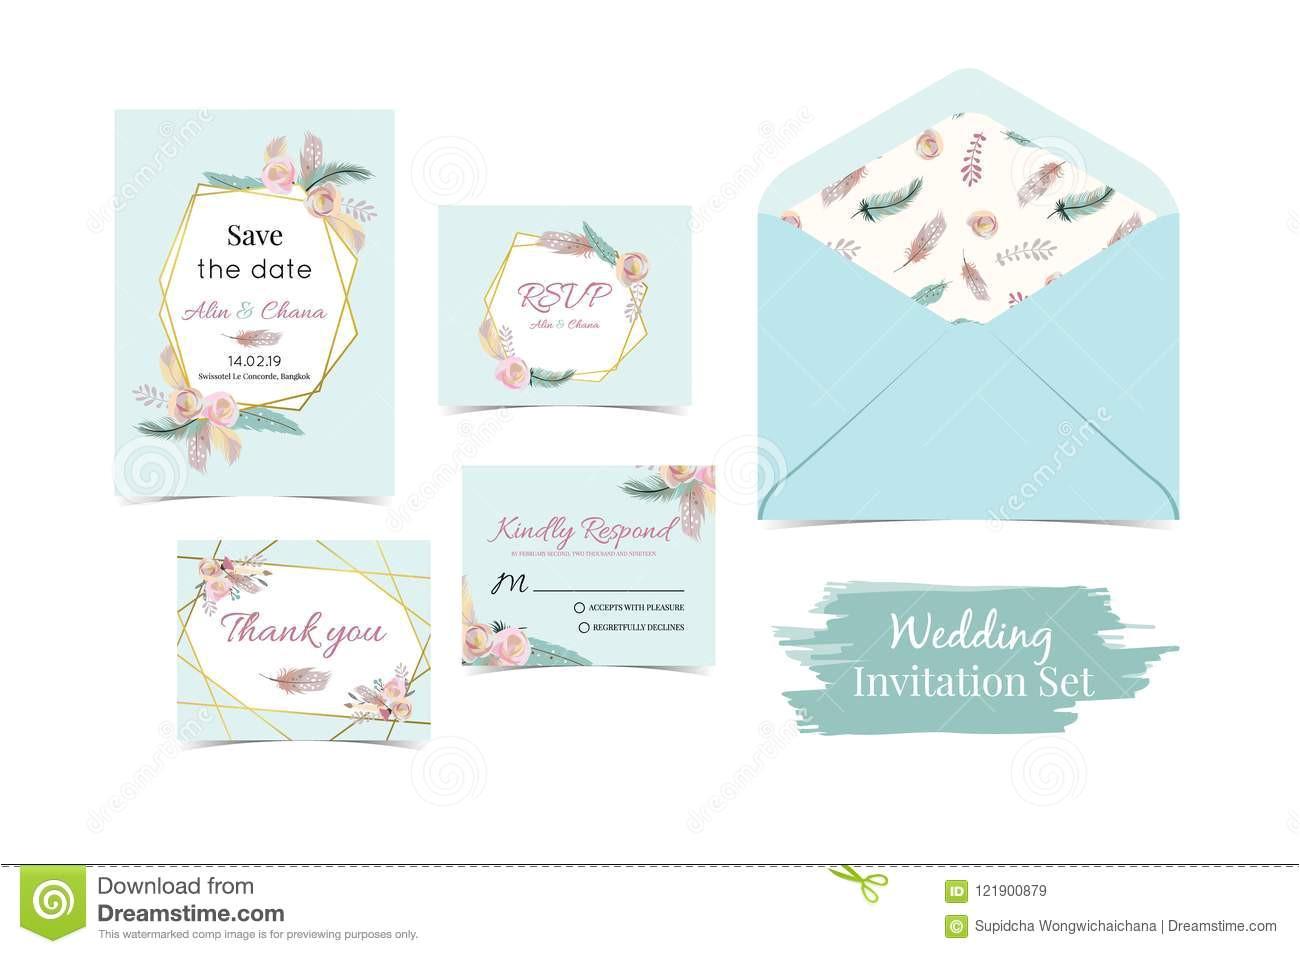 geometry blue green gold wedding invitation set envelope t geometry blue green gold wedding invitation set envelope 121900879 jpg